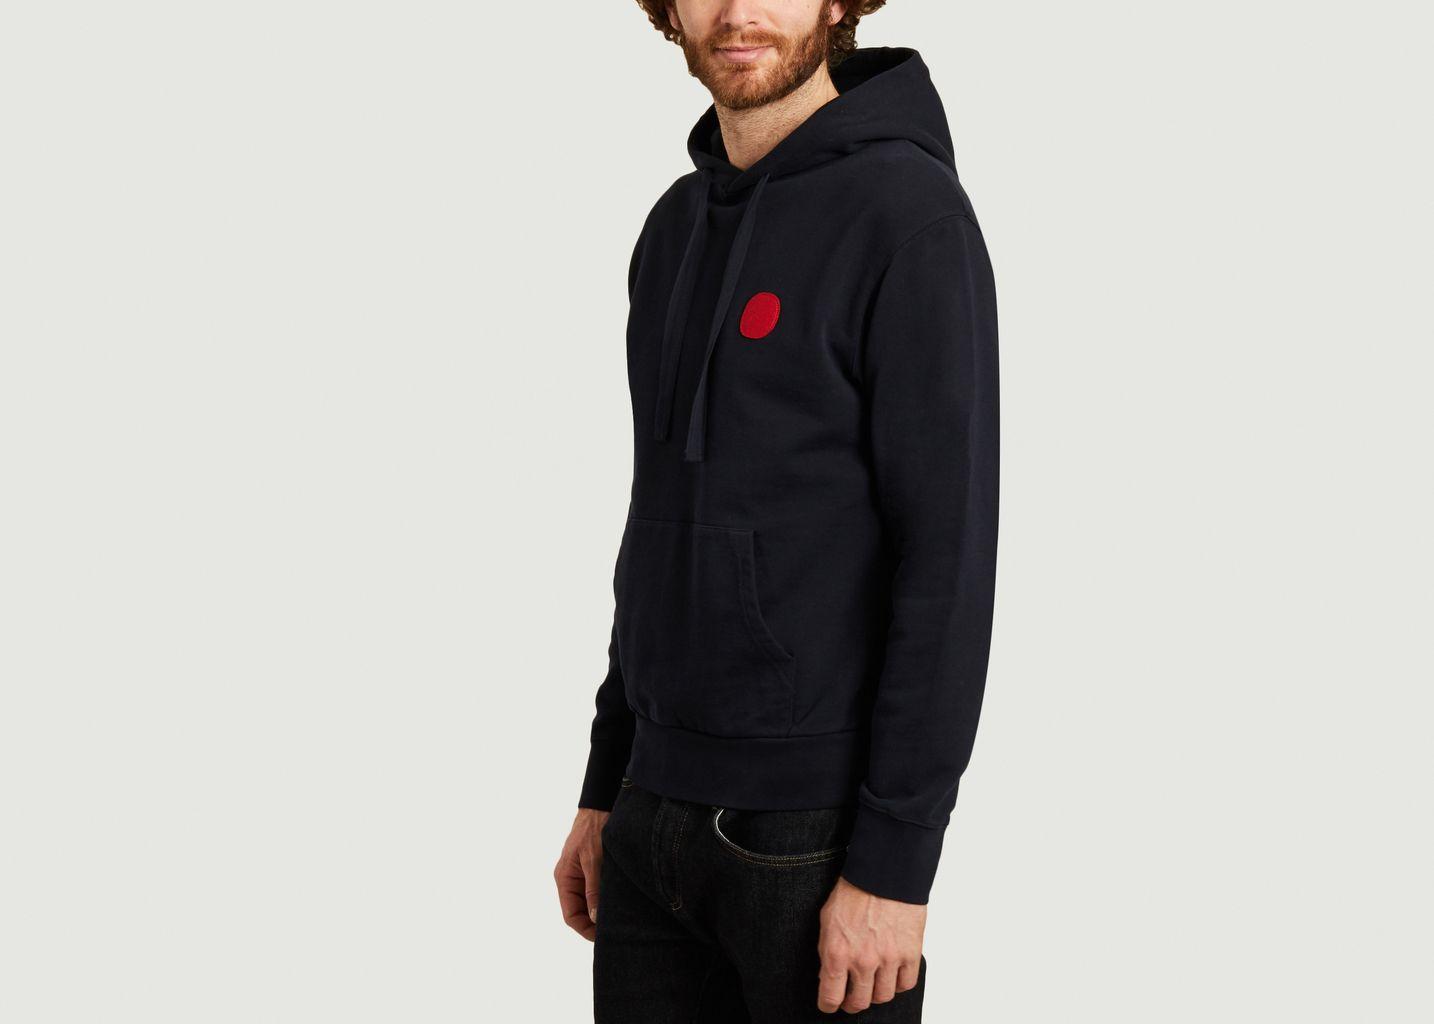 Sweatshirt à capuche Sudadera - Loreak Mendian